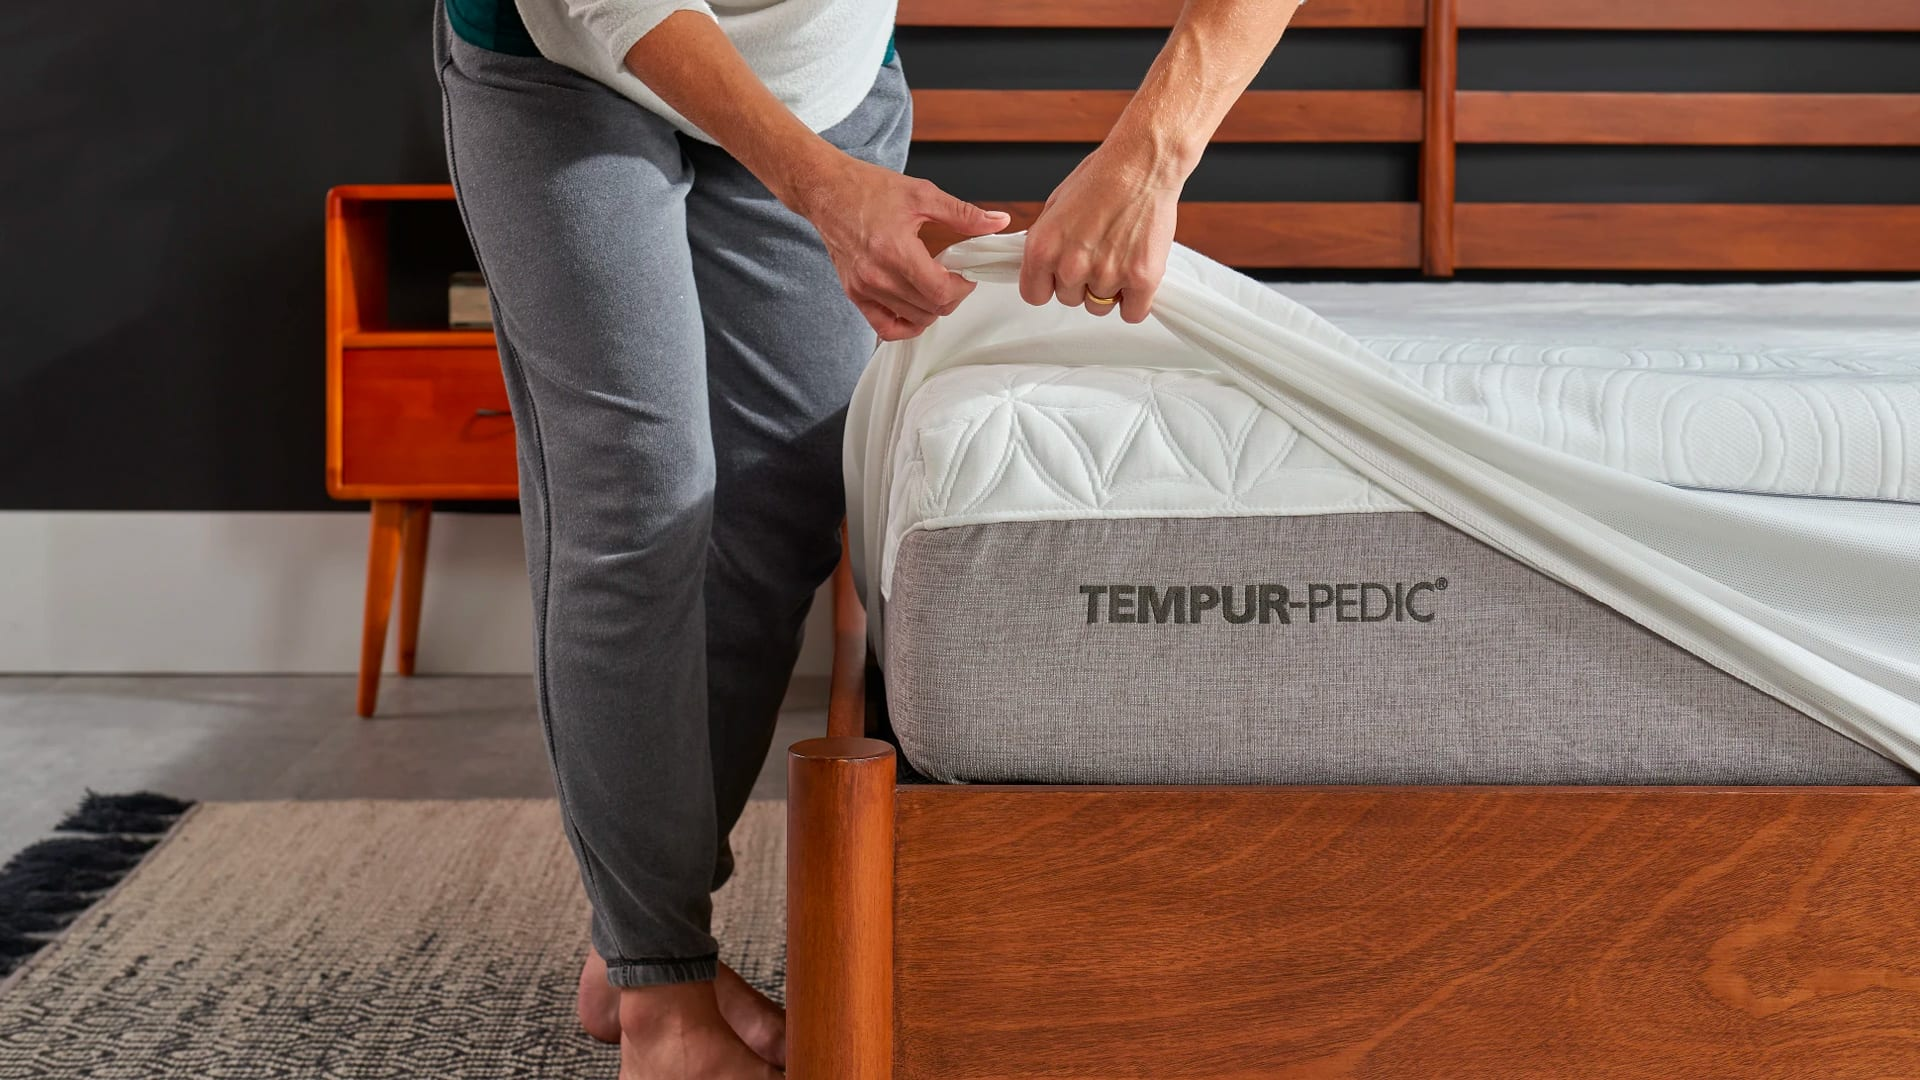 Tempur-Pedic Mattress Protector